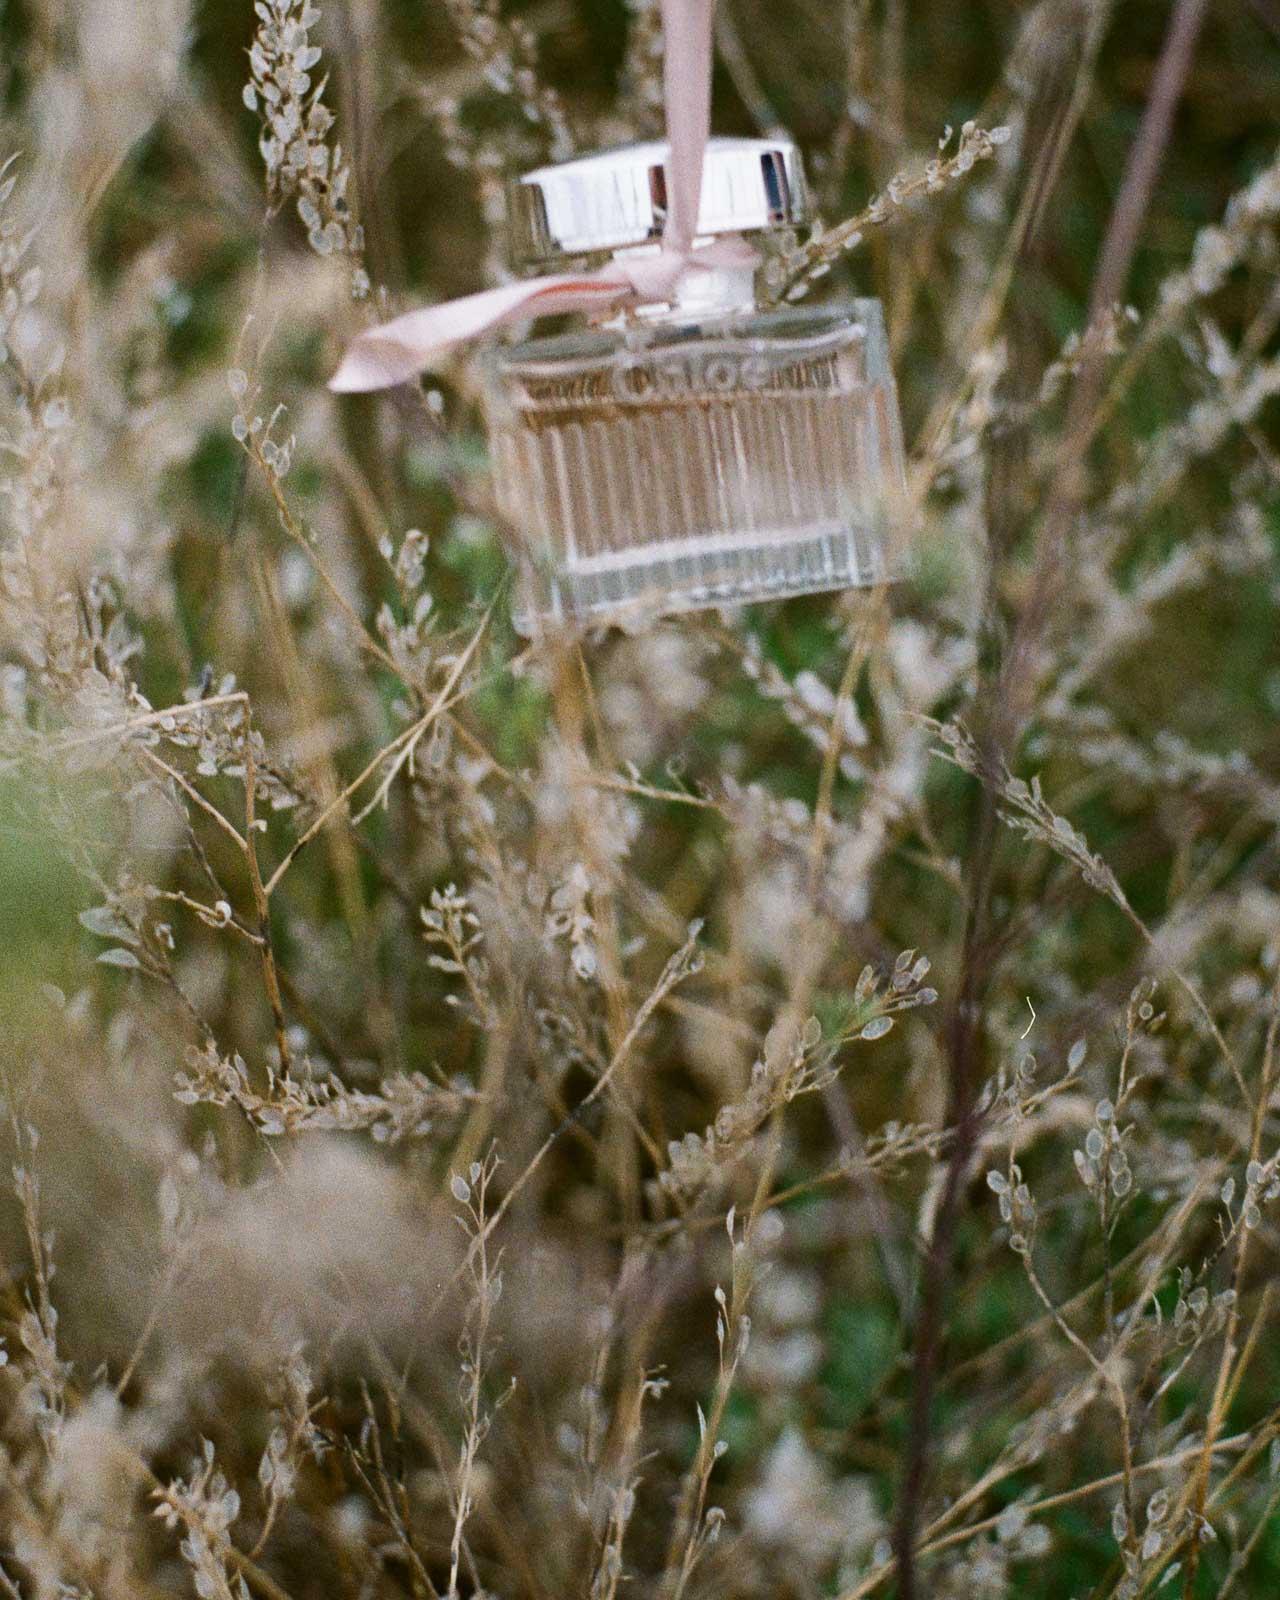 Chloé L'eau perfume shot by Marius Knieling